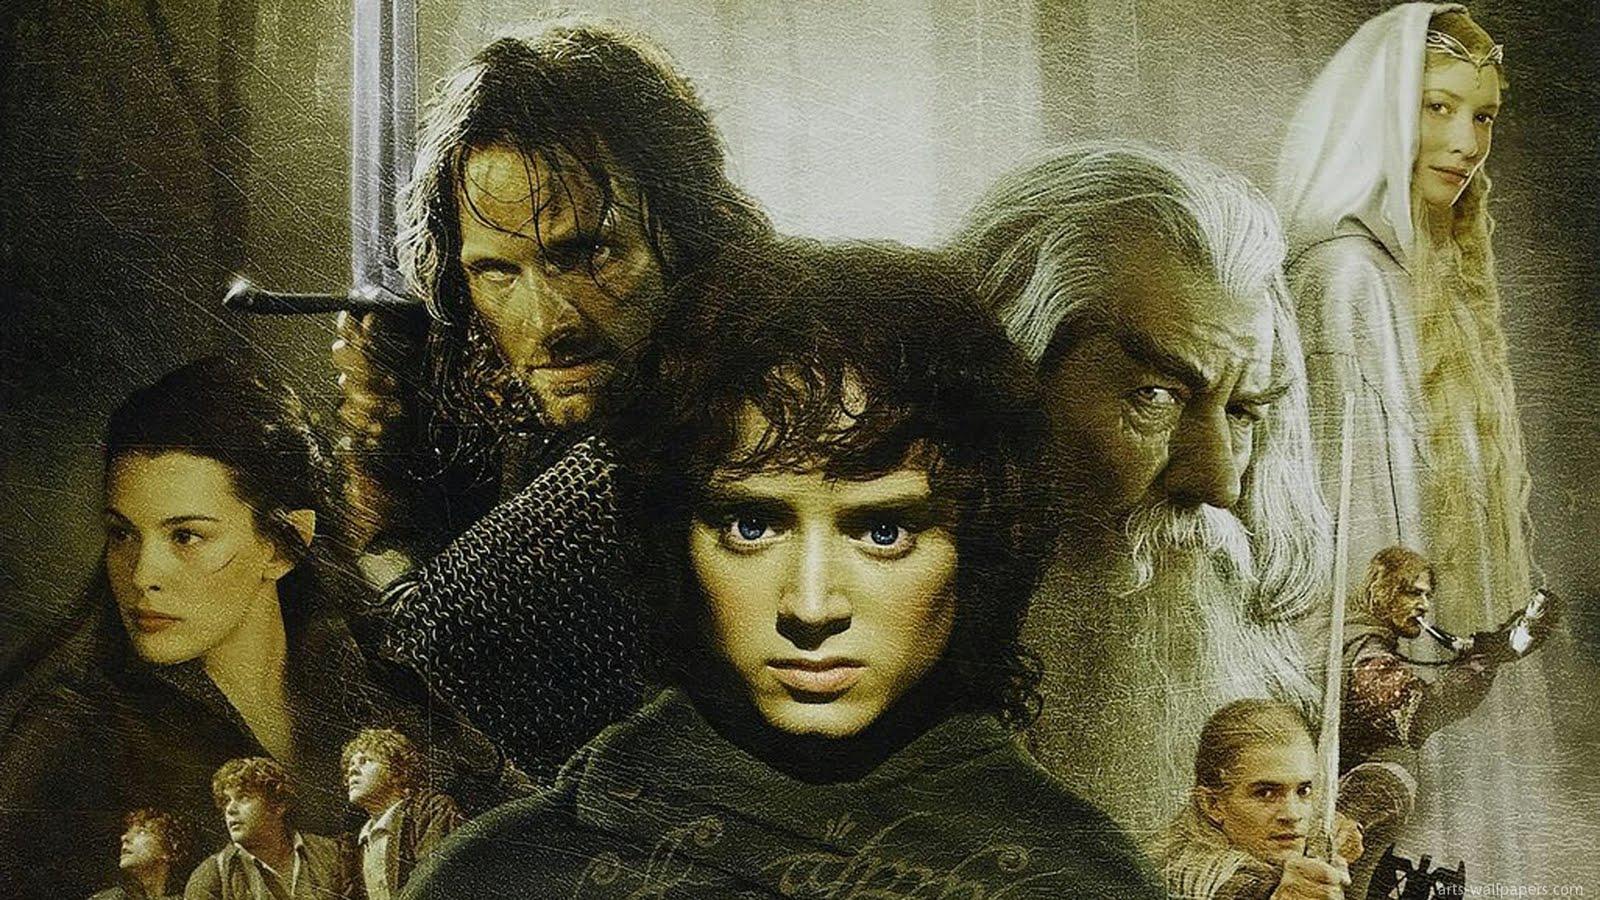 http://3.bp.blogspot.com/-It9tWNr3IrE/TXHBqil5L0I/AAAAAAAAAAk/PfgpVDE-wfw/s1600/The-Lord-of-the-Rings-The-Fellowship-of-the-Ring-1.jpg